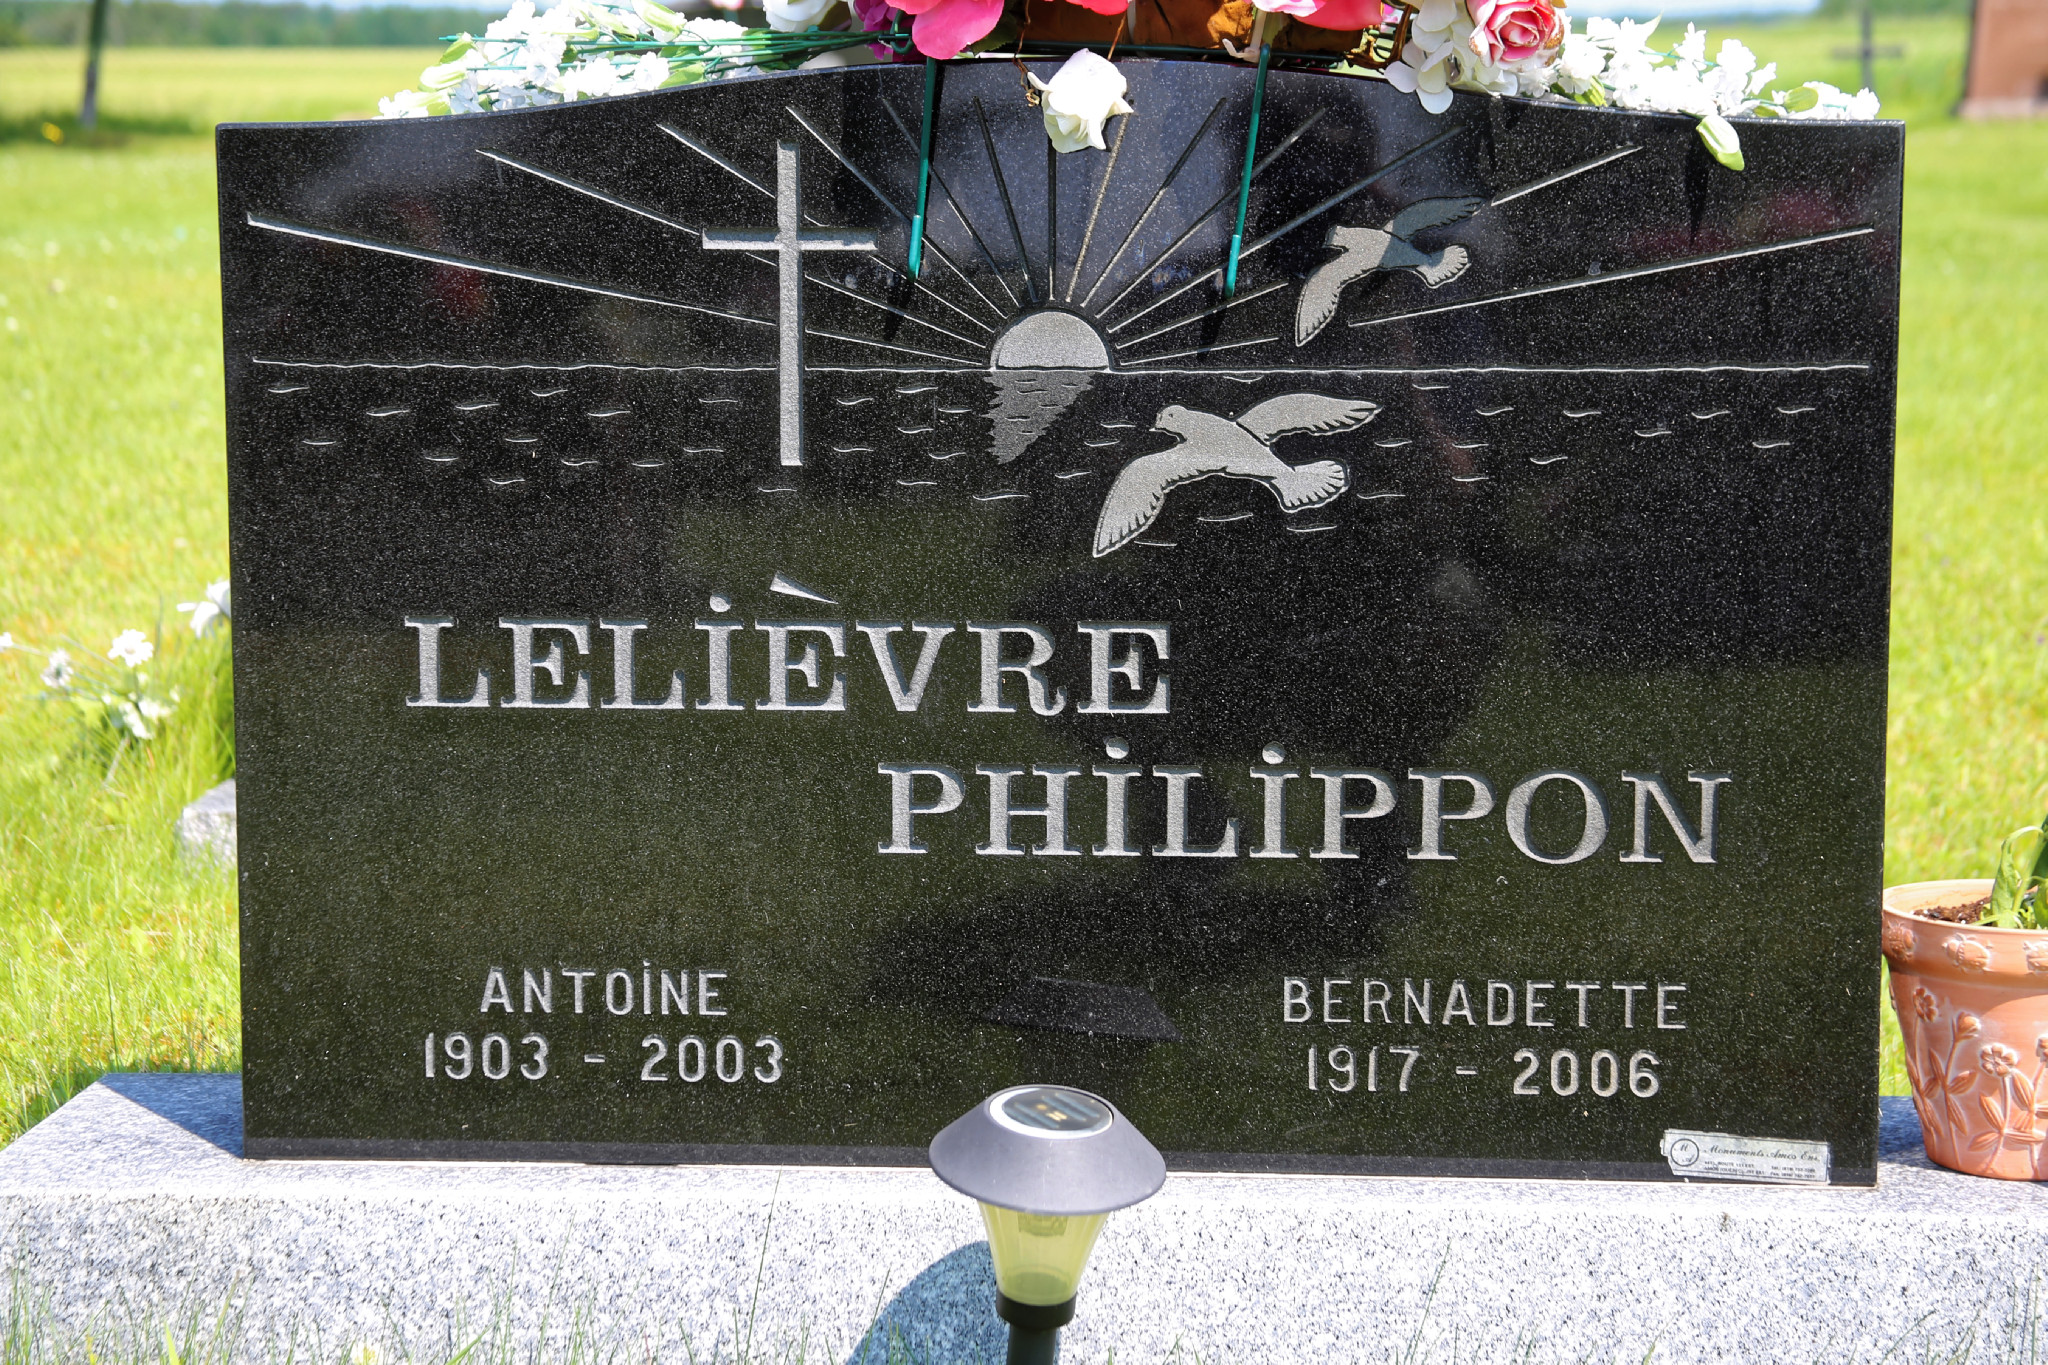 Antoine Lelièvre